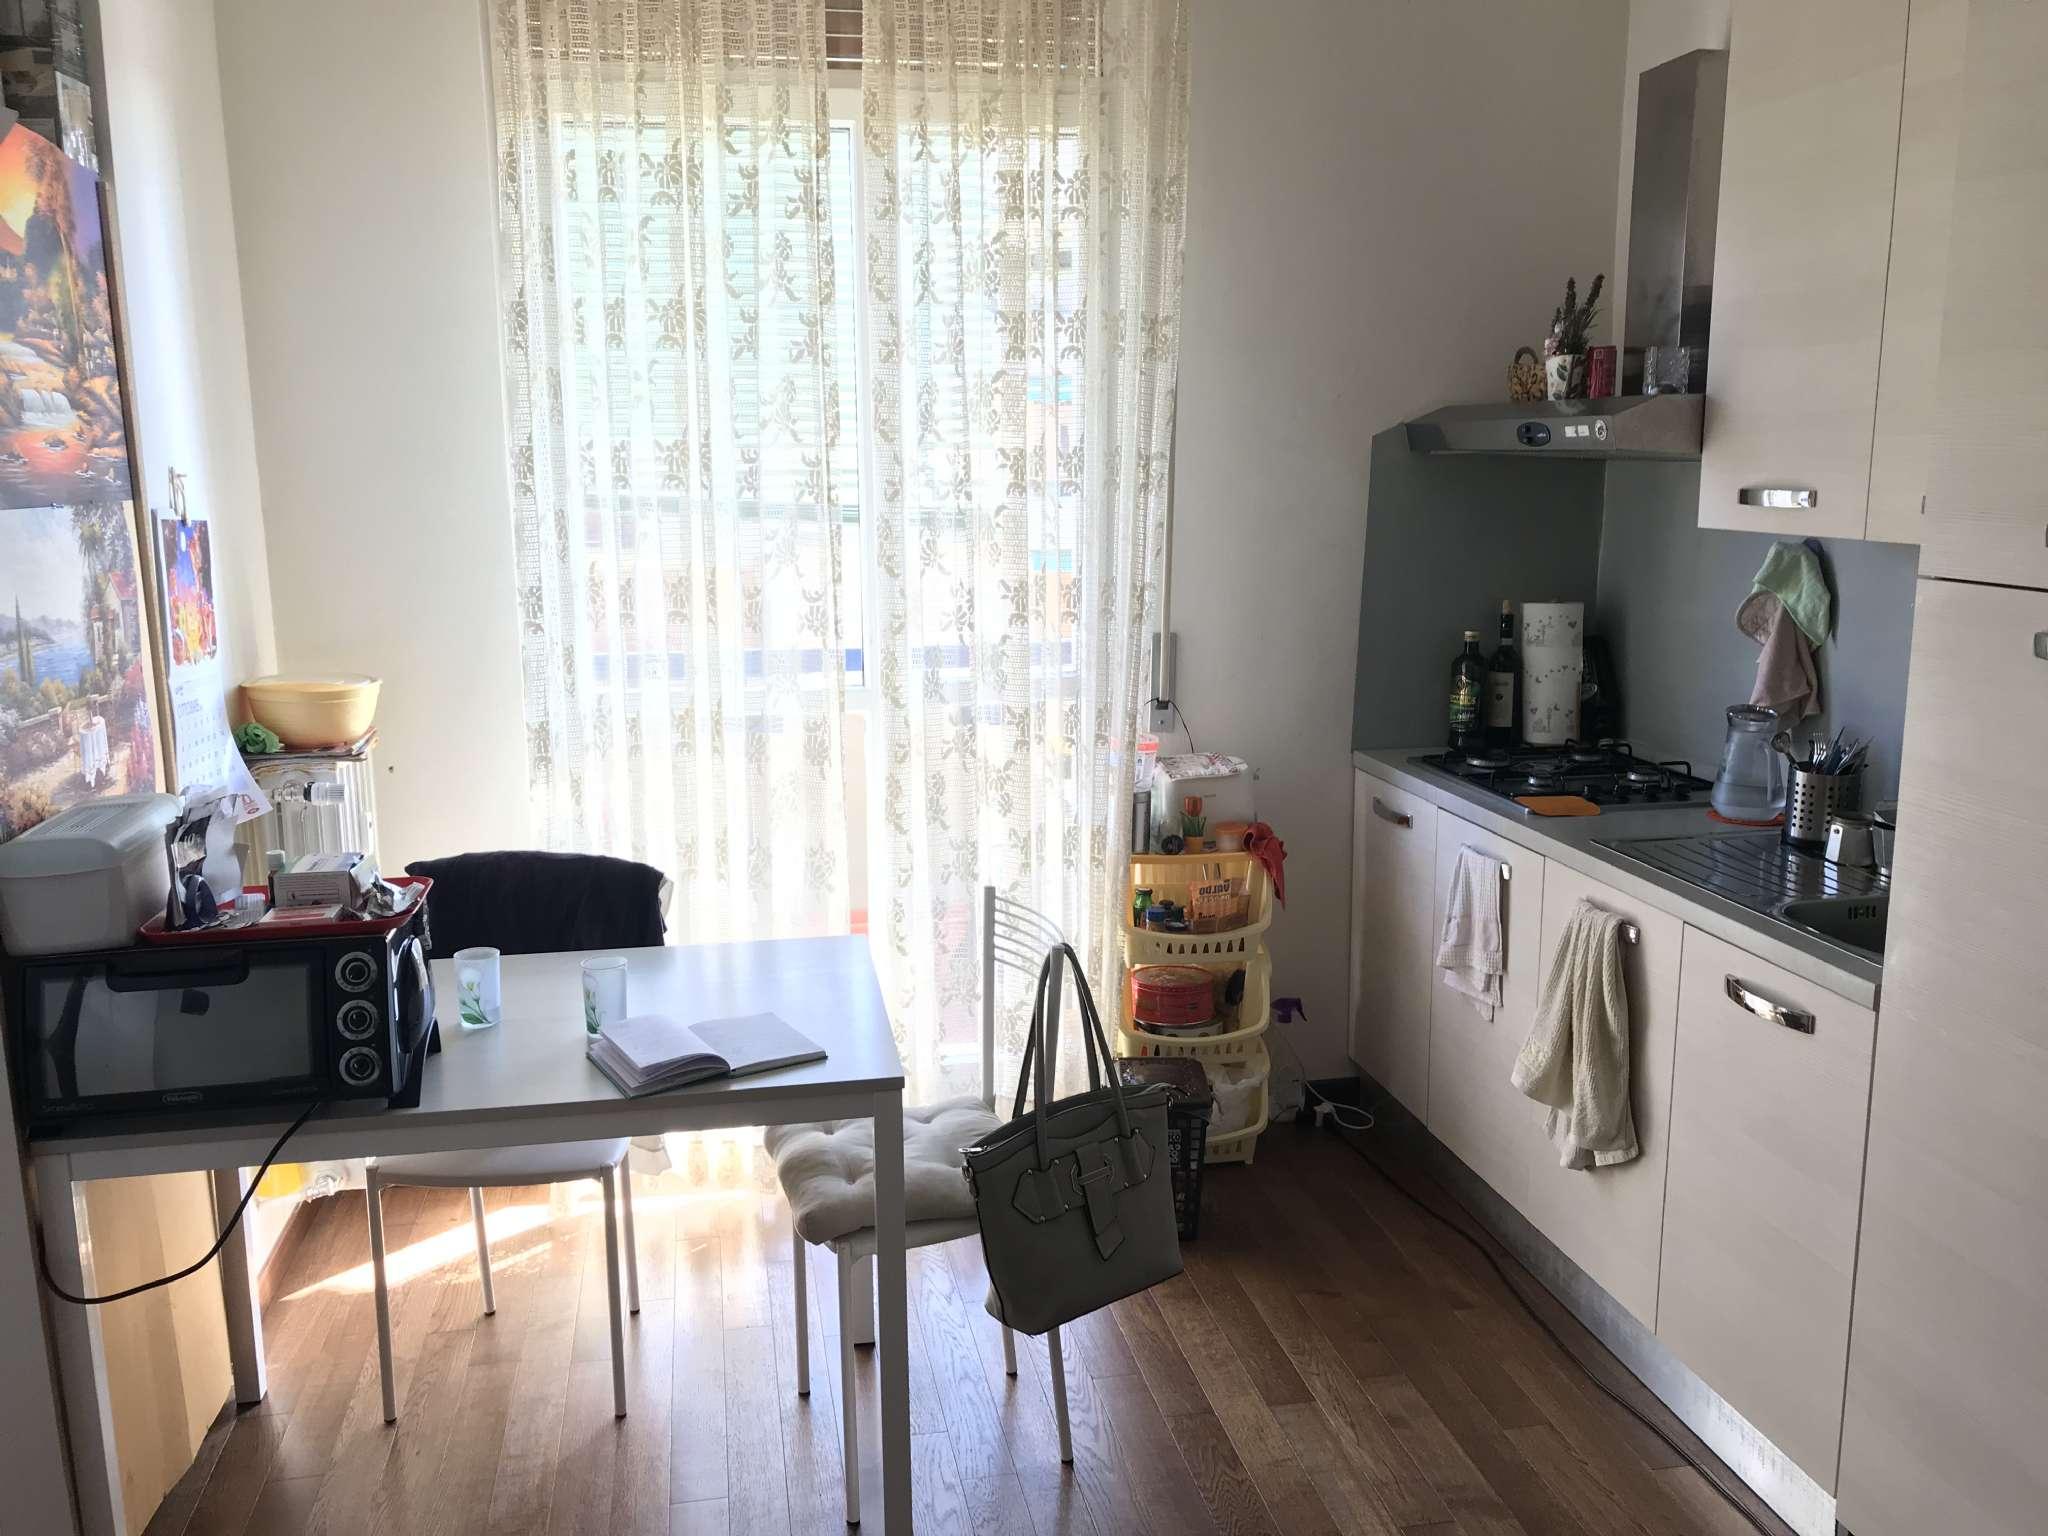 Appartamento in Vendita a Firenze Periferia Nord:  2 locali, 40 mq  - Foto 1